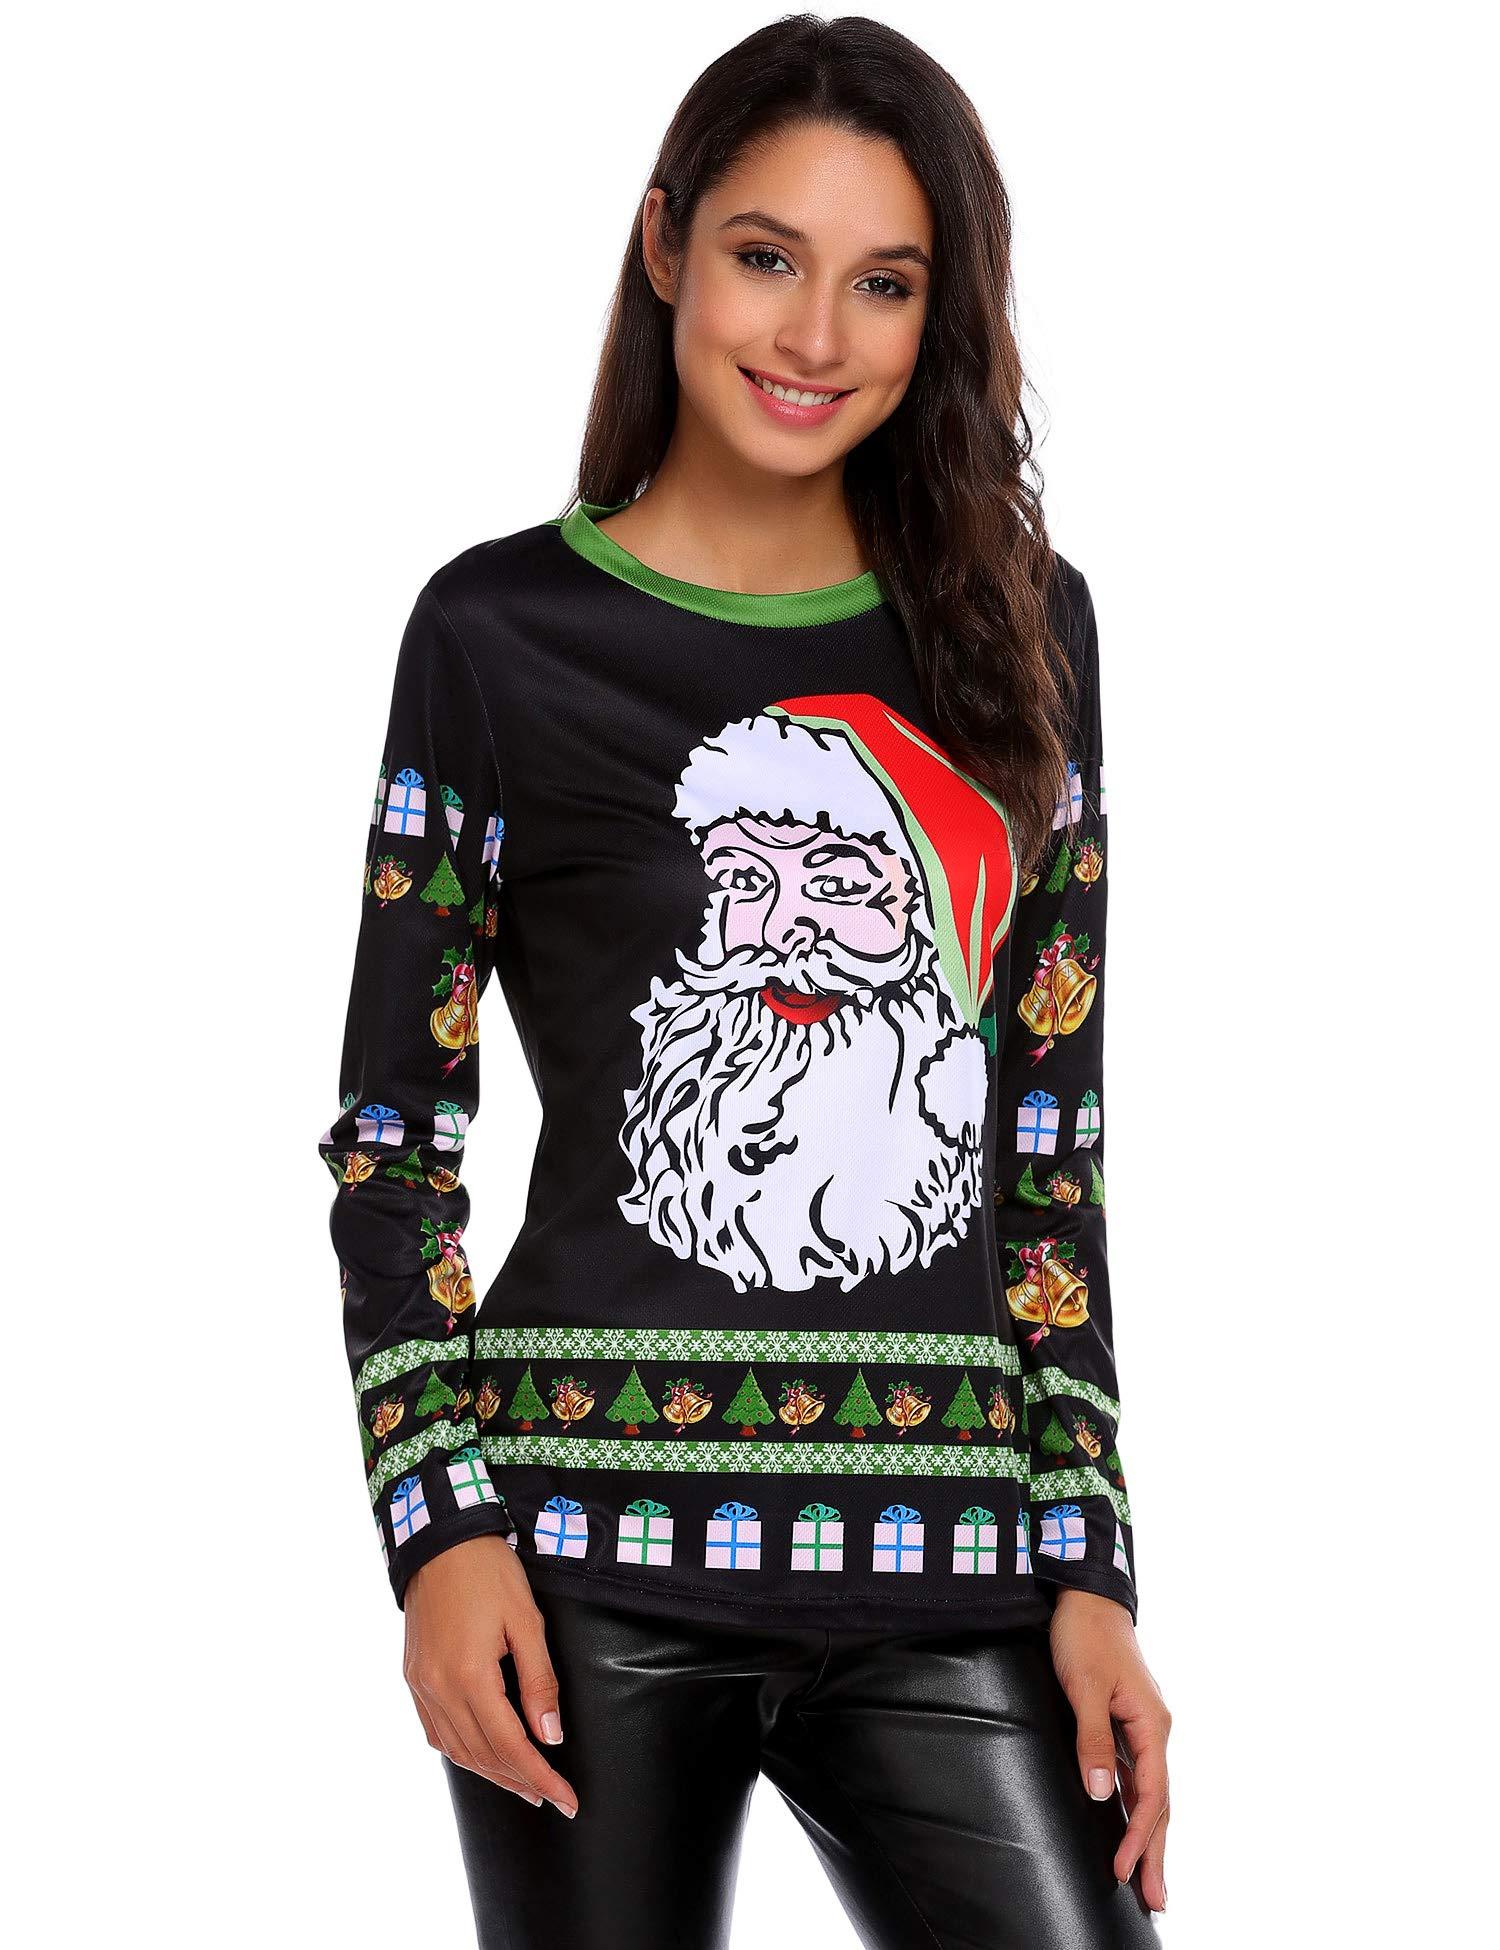 Yhlovg Women's Long Sleeve Christmas Santa Pattern Casual Tops